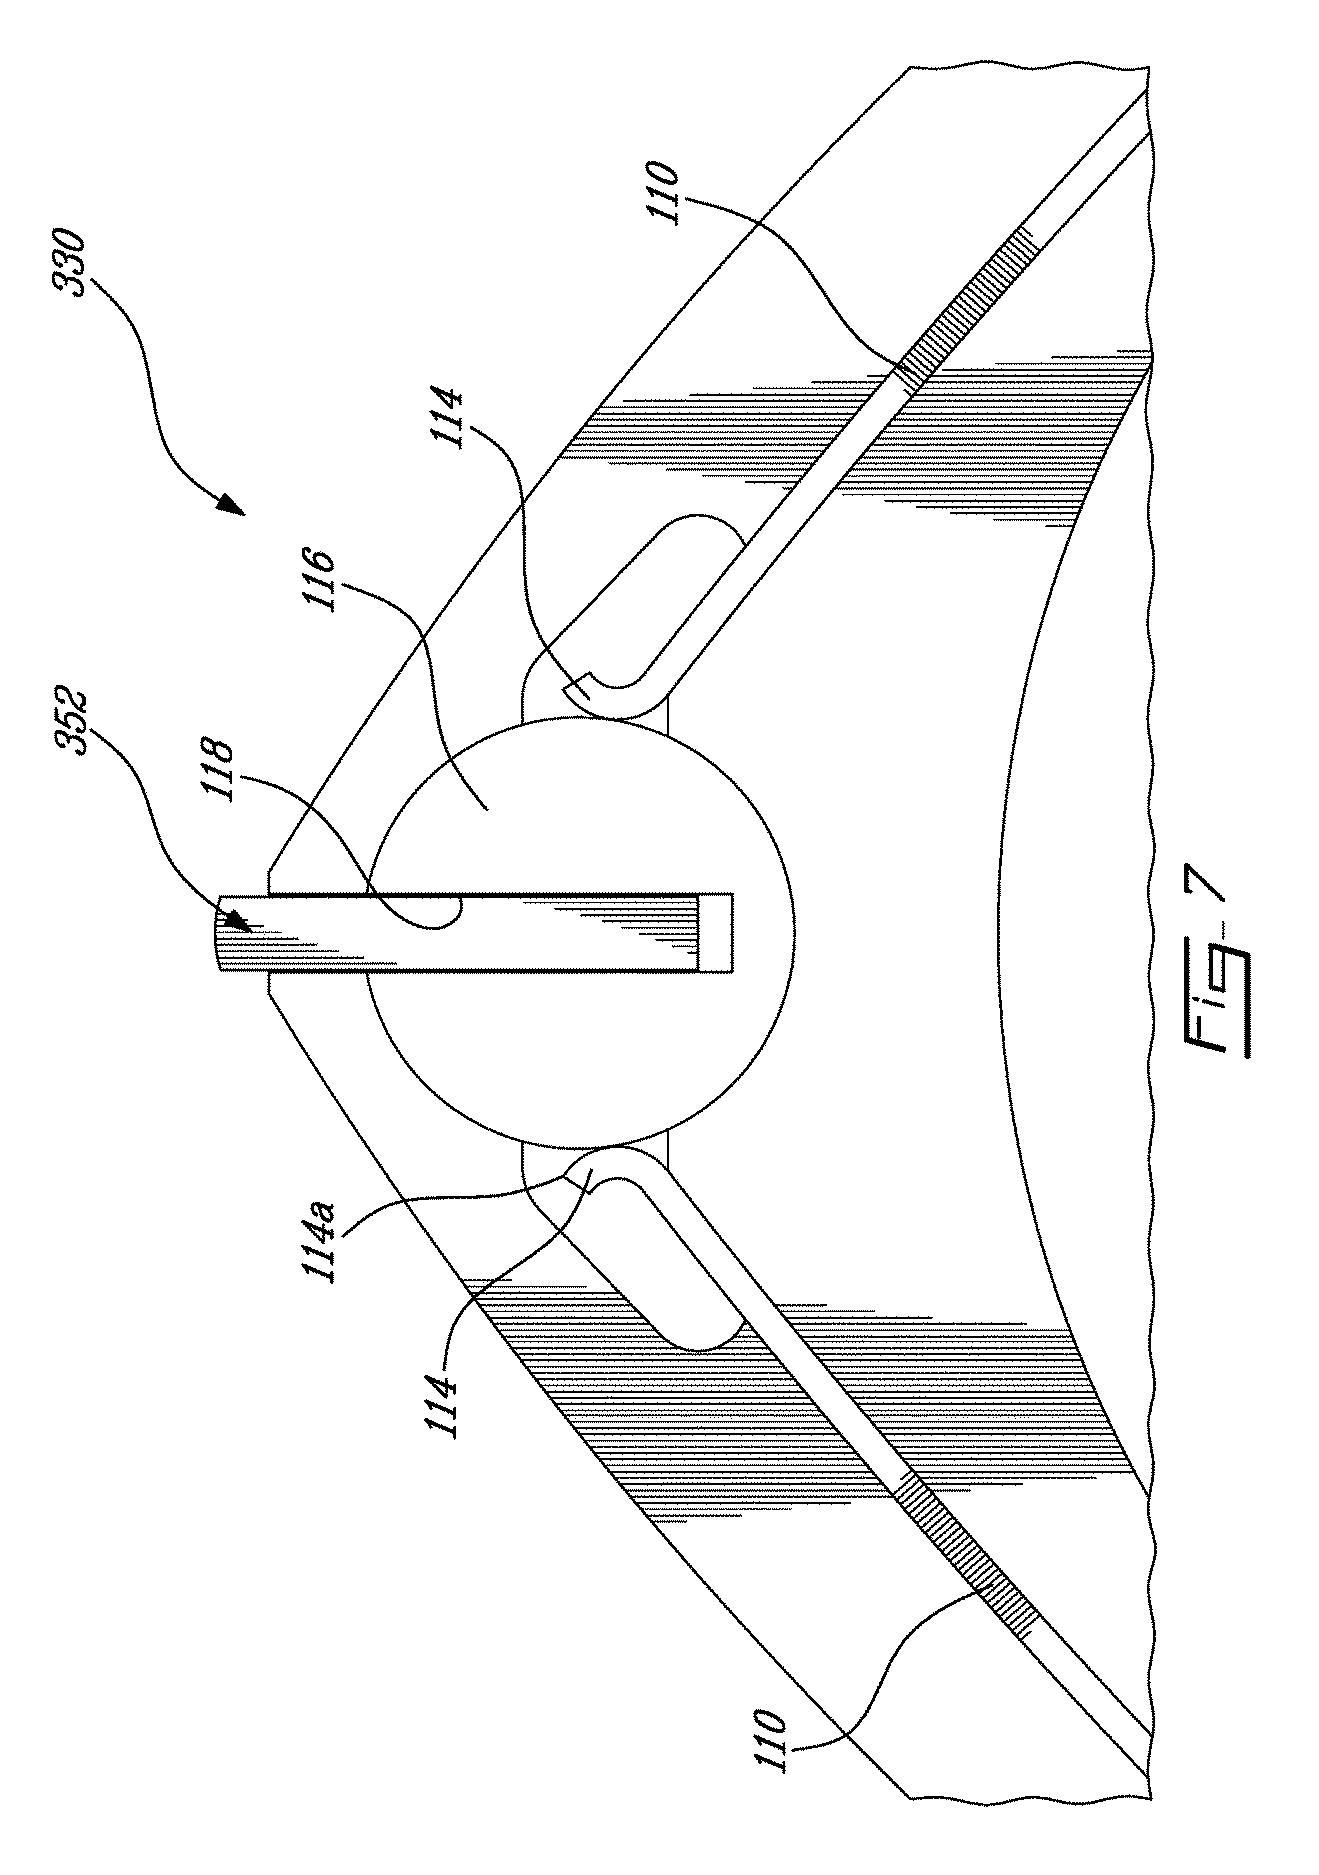 Pratt Amp Whitney Rotary Engine Patents